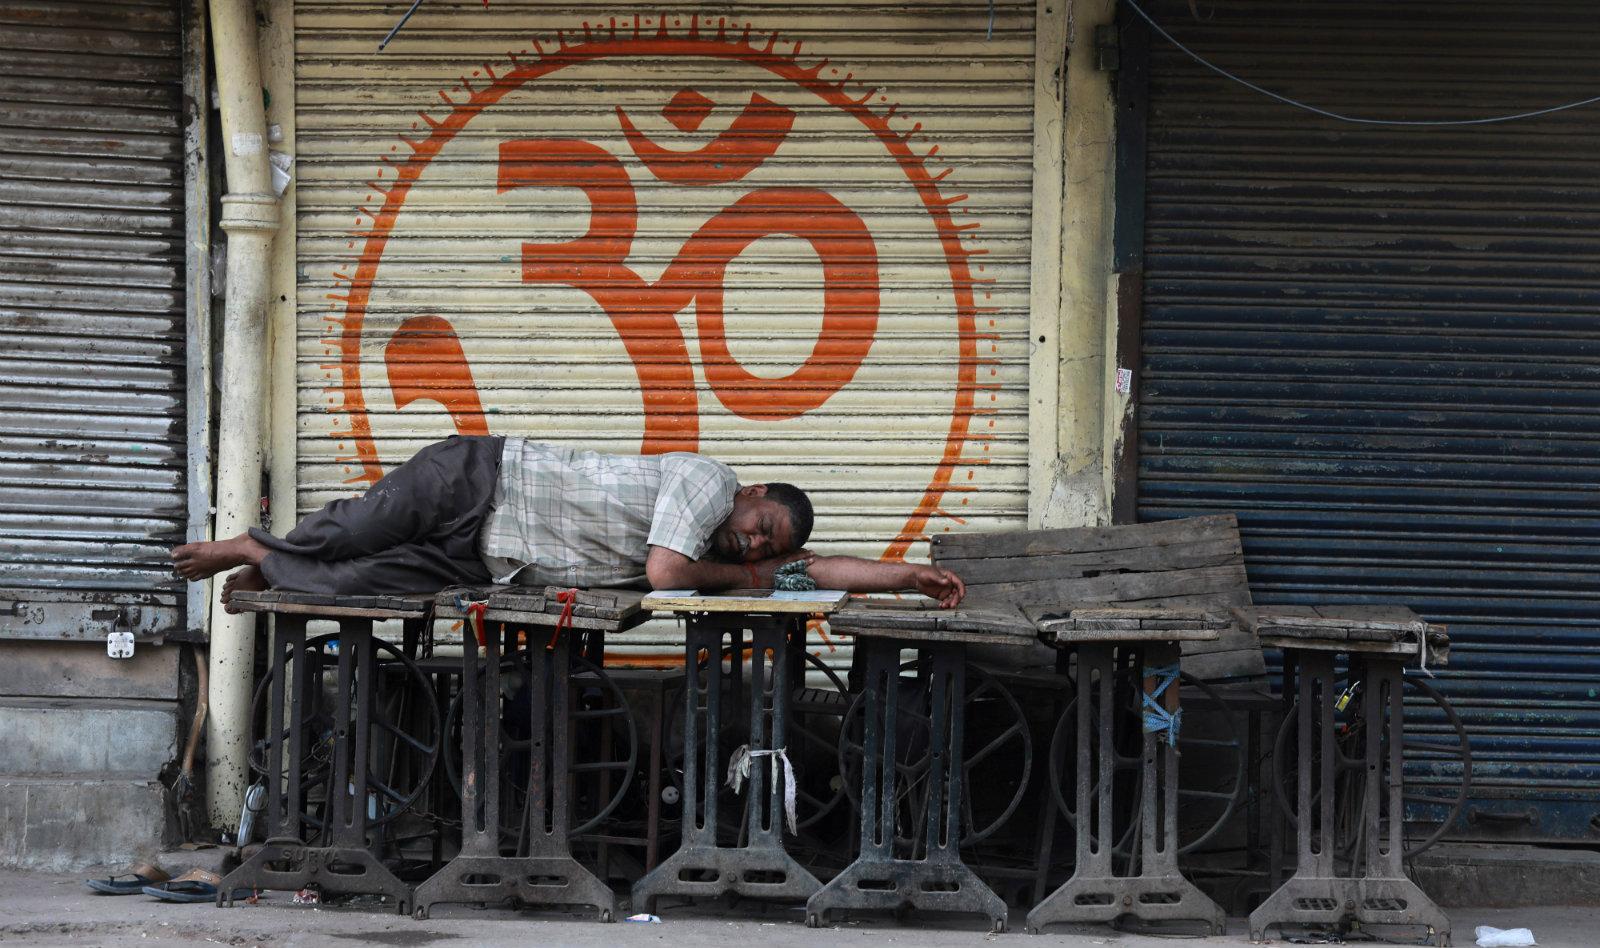 How will coronavirus impact India's economy as per Moody's, Fitch thumbnail